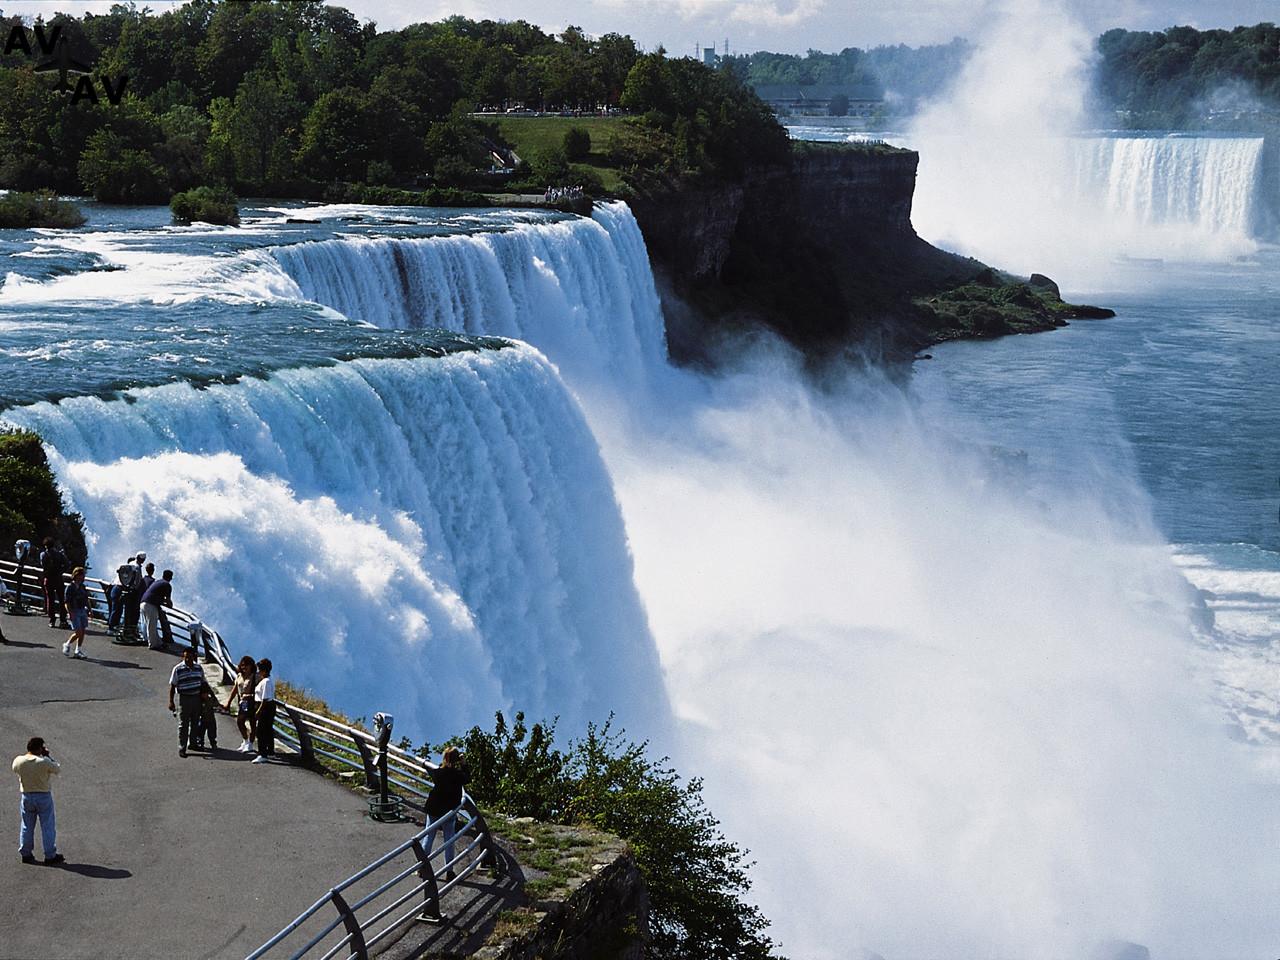 Interesnyie faktyi o Niagarskom vodopade - Интересные факты о Ниагарском водопаде